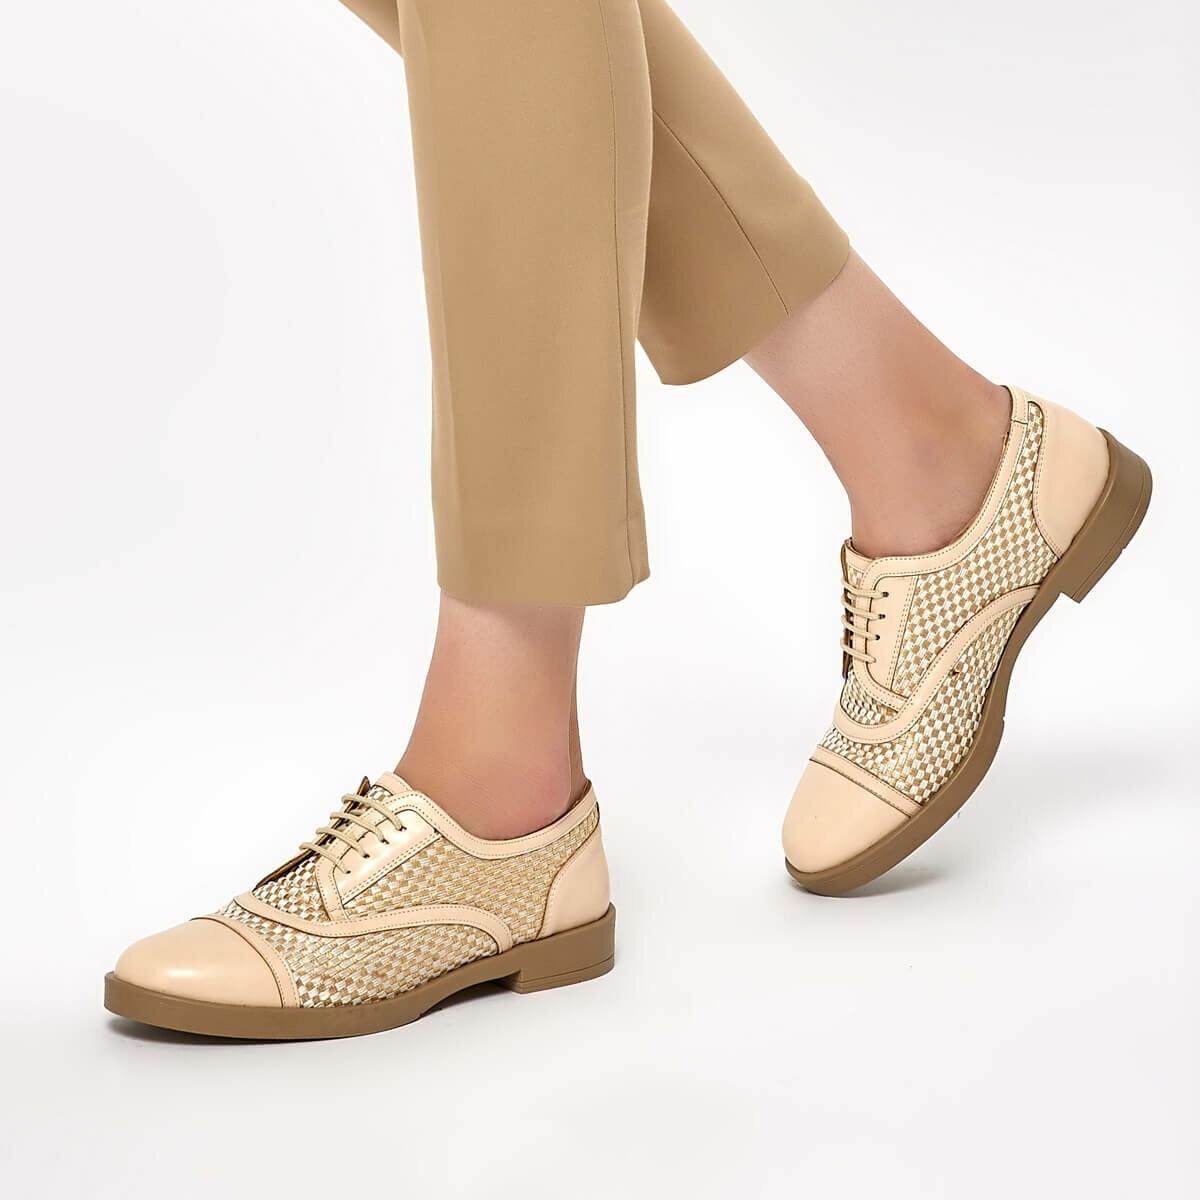 FLO DS19040 Beige Women Oxford Shoes Miss F